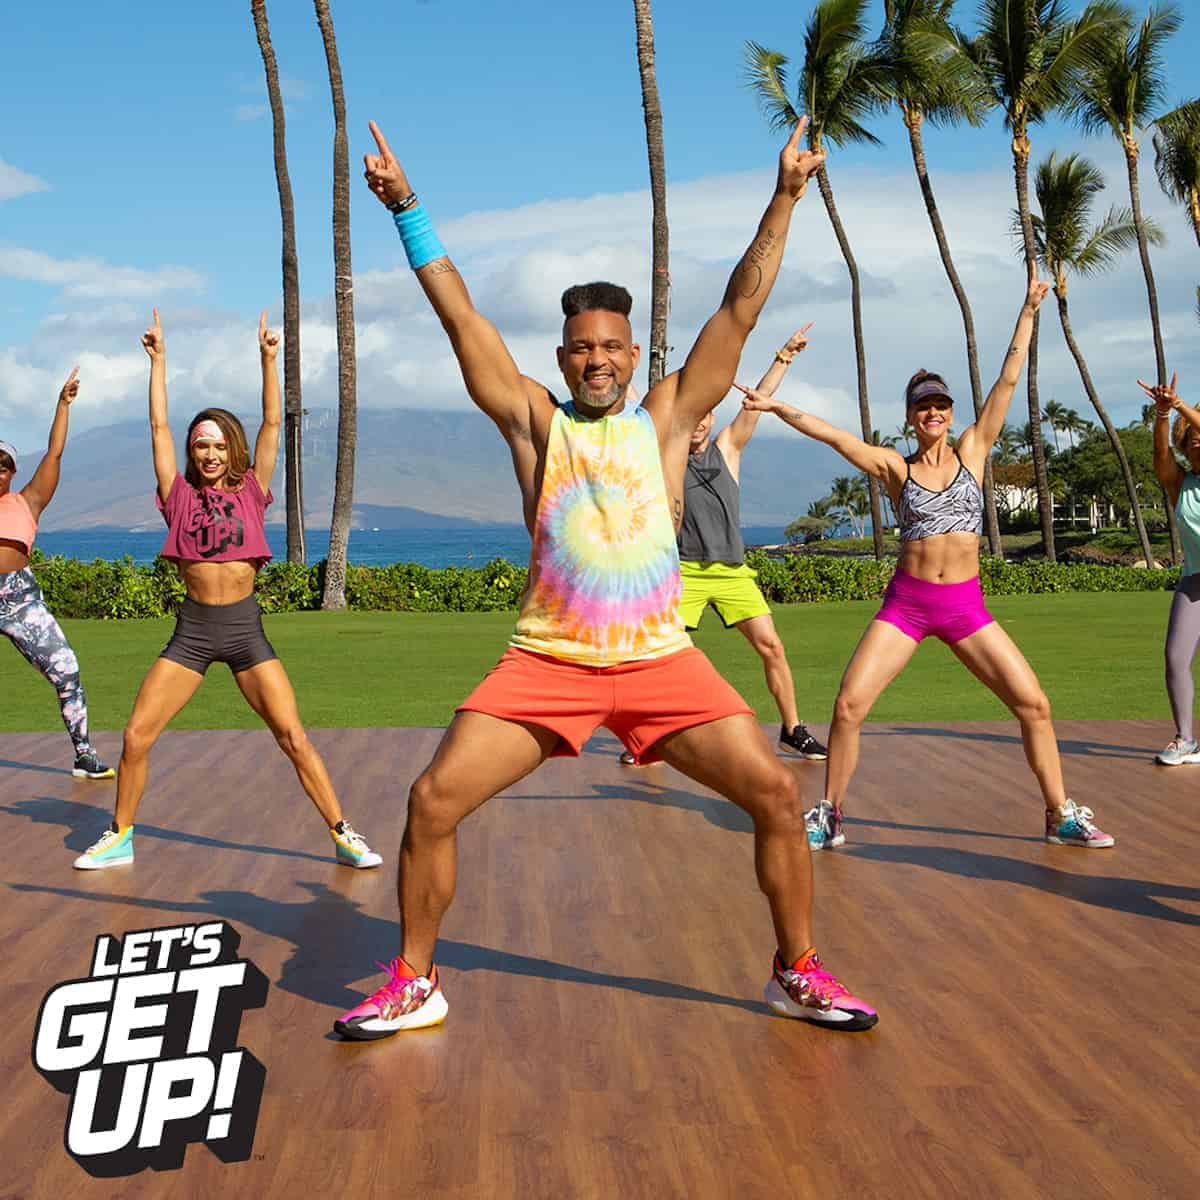 let's get up workout